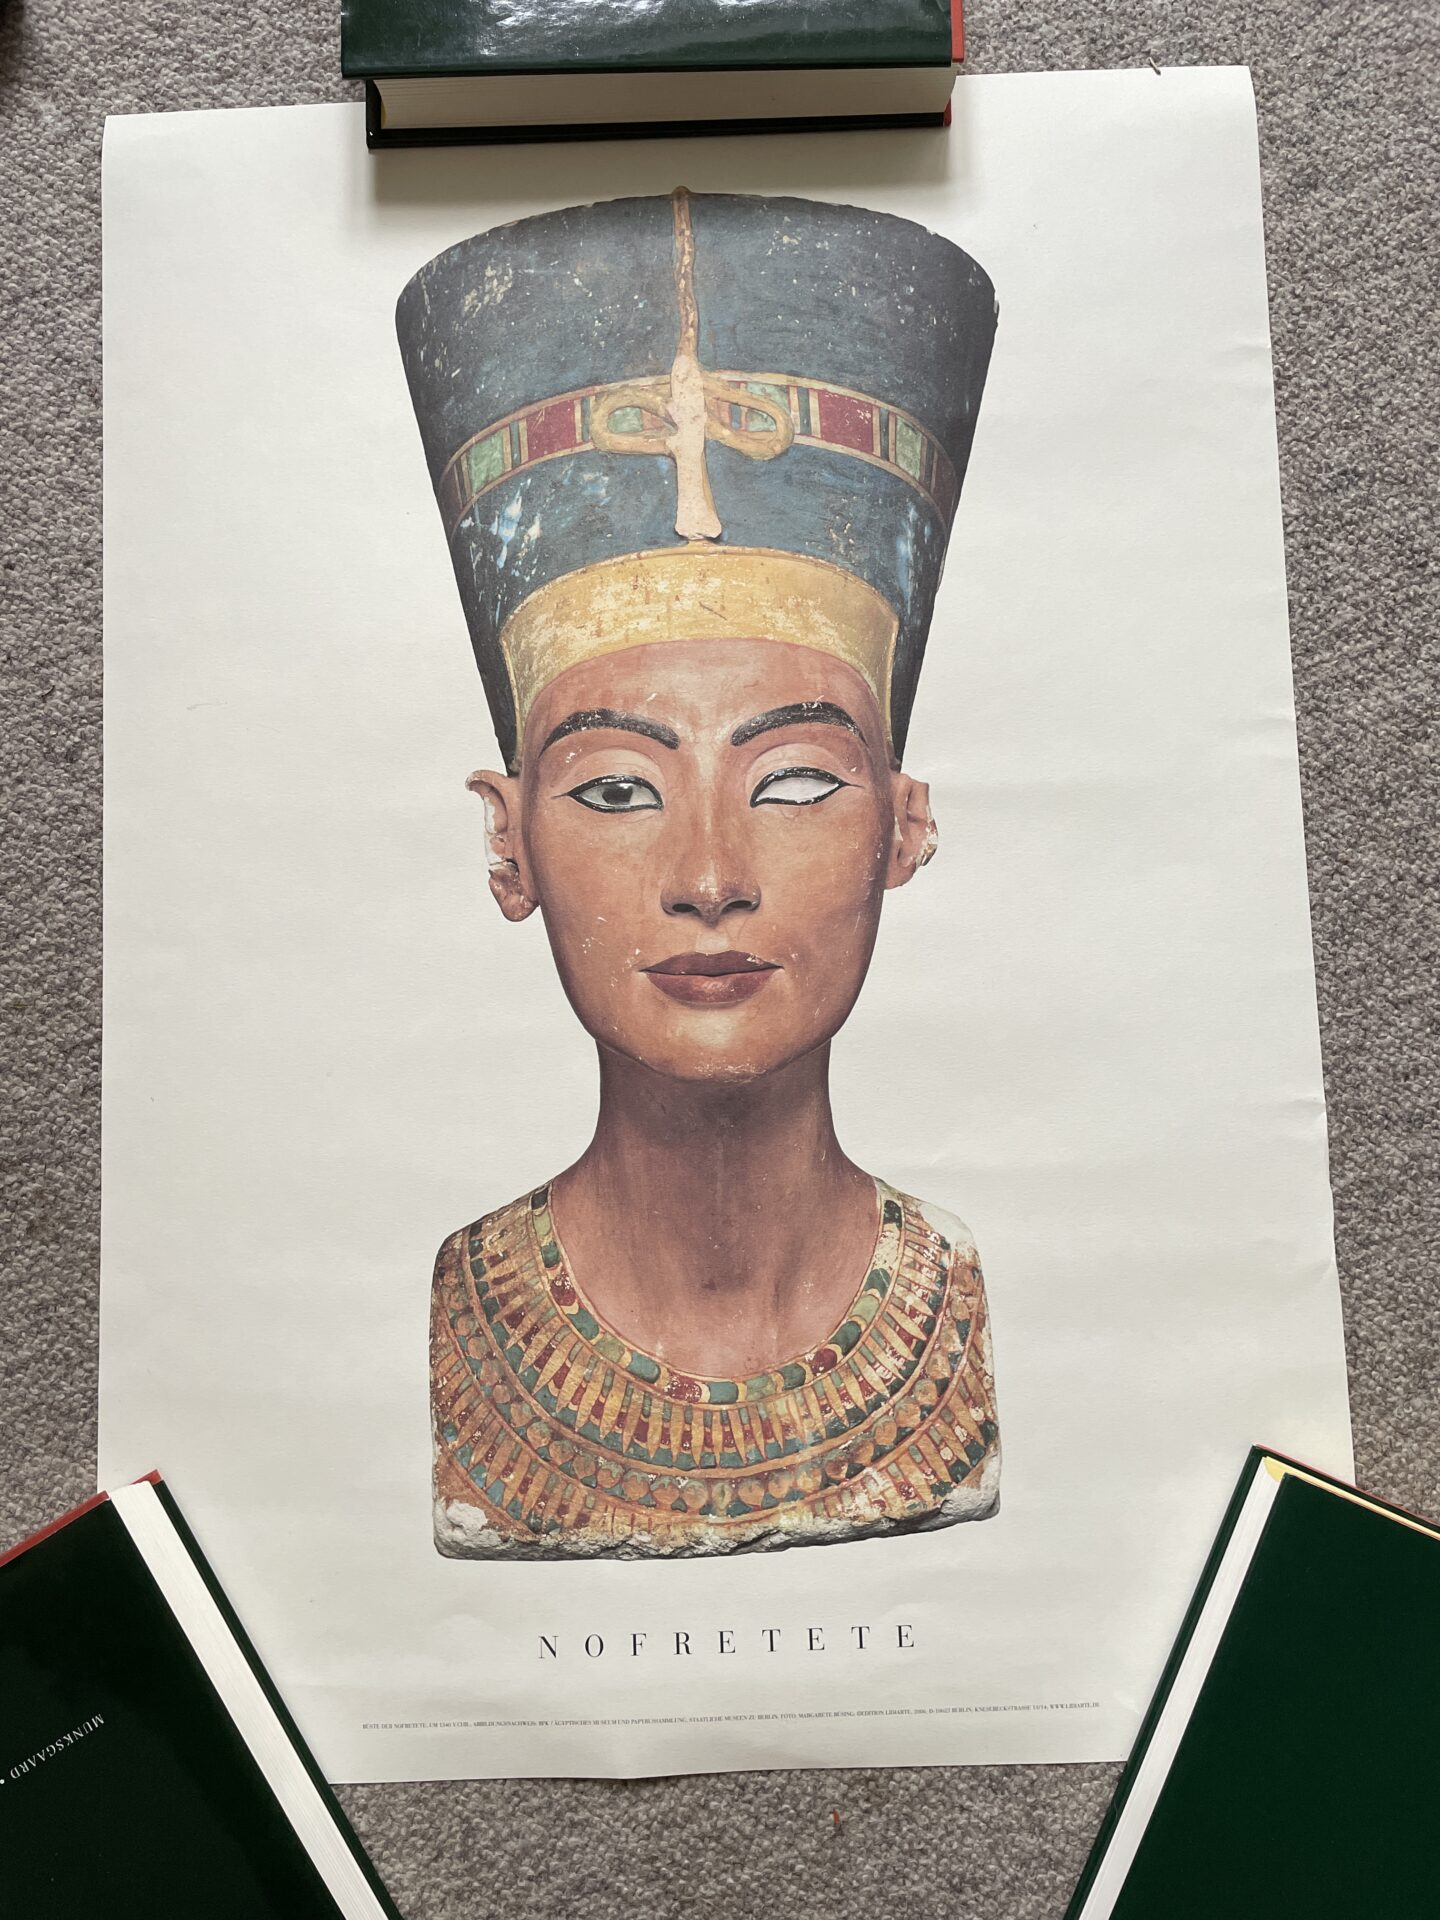 Tysk kunsttryk, 50x70 cm, rullet, Dronning Nofretete, pris 300kr